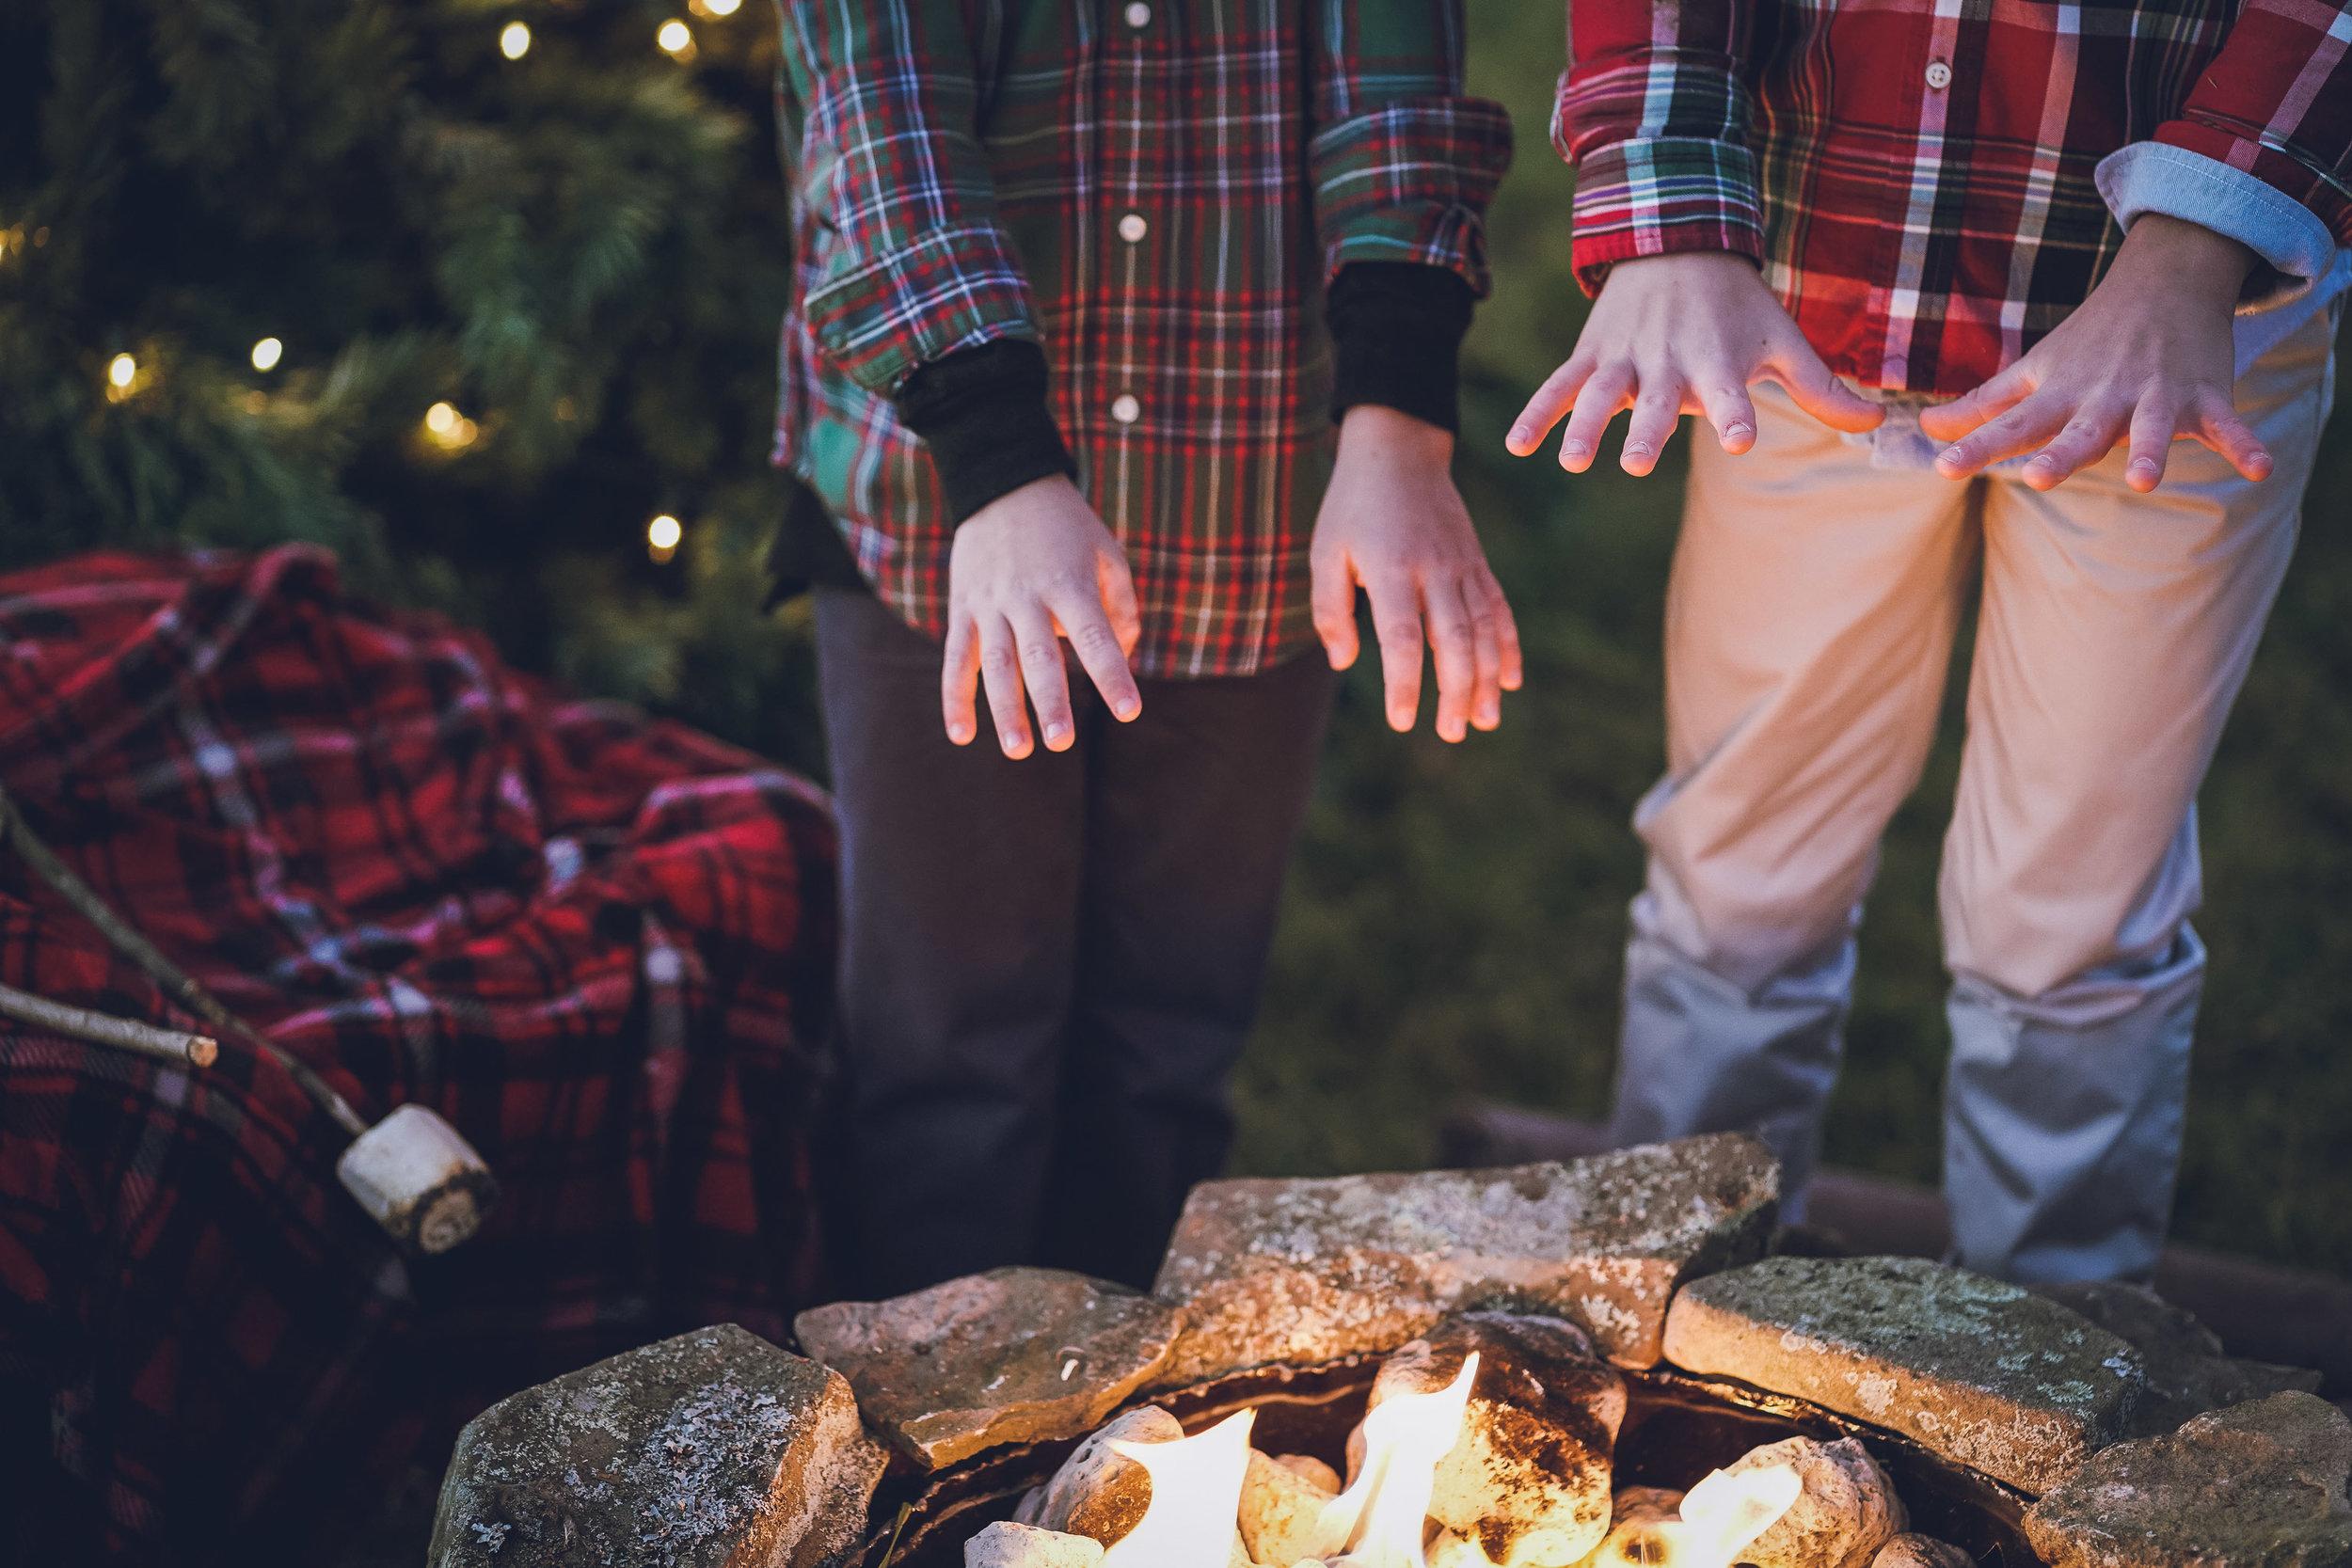 Clarks-Summit-Scranton-Photographers-christmas-holidays-card-4.jpg